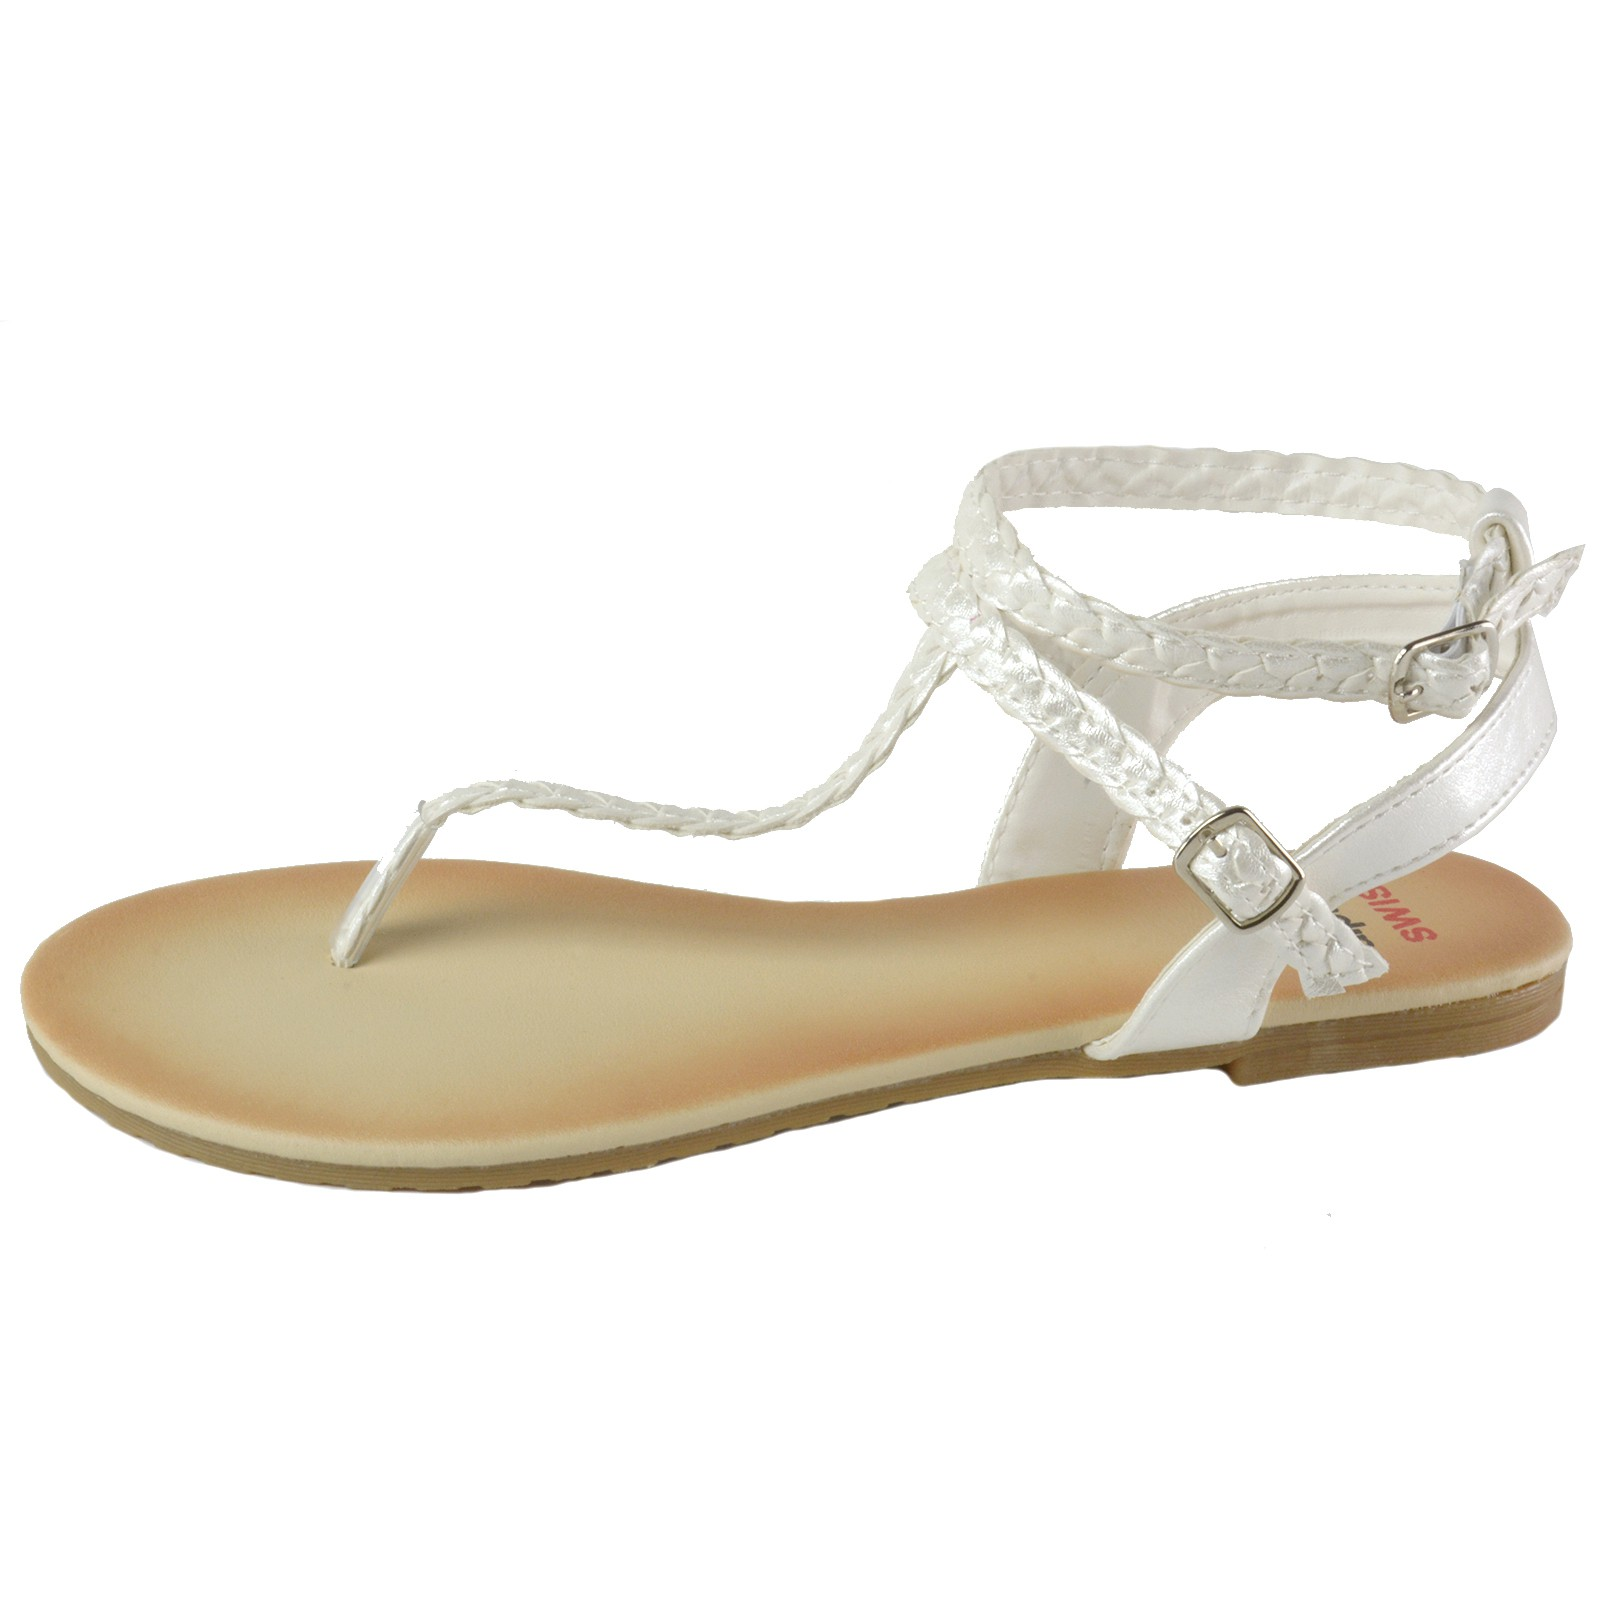 7fcbe683378 Alpine Swiss Womens Gladiator Sandals Braided T-Strap Slingback ...